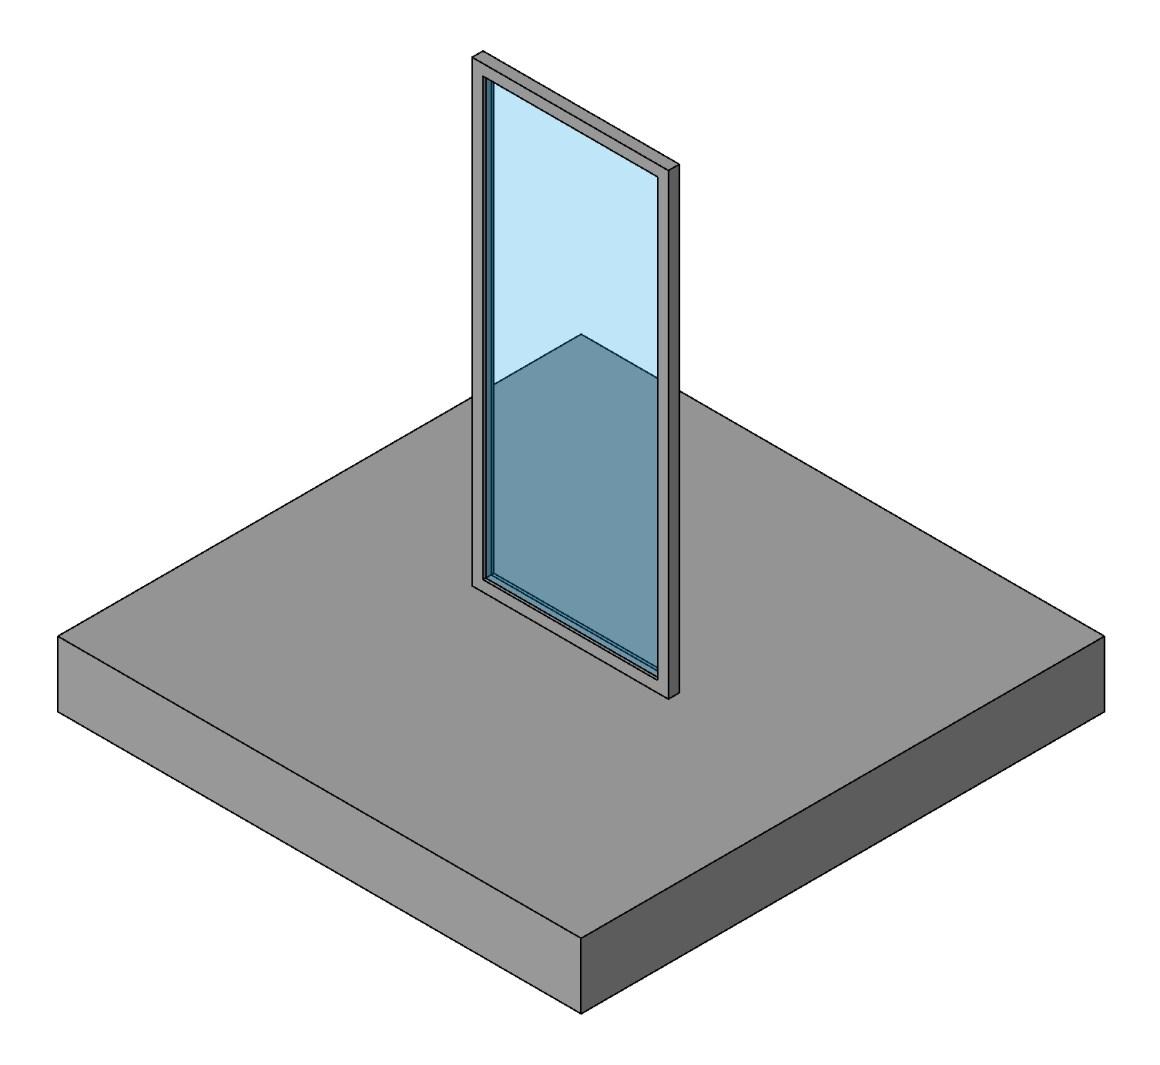 nanawall-doorpanel-3d